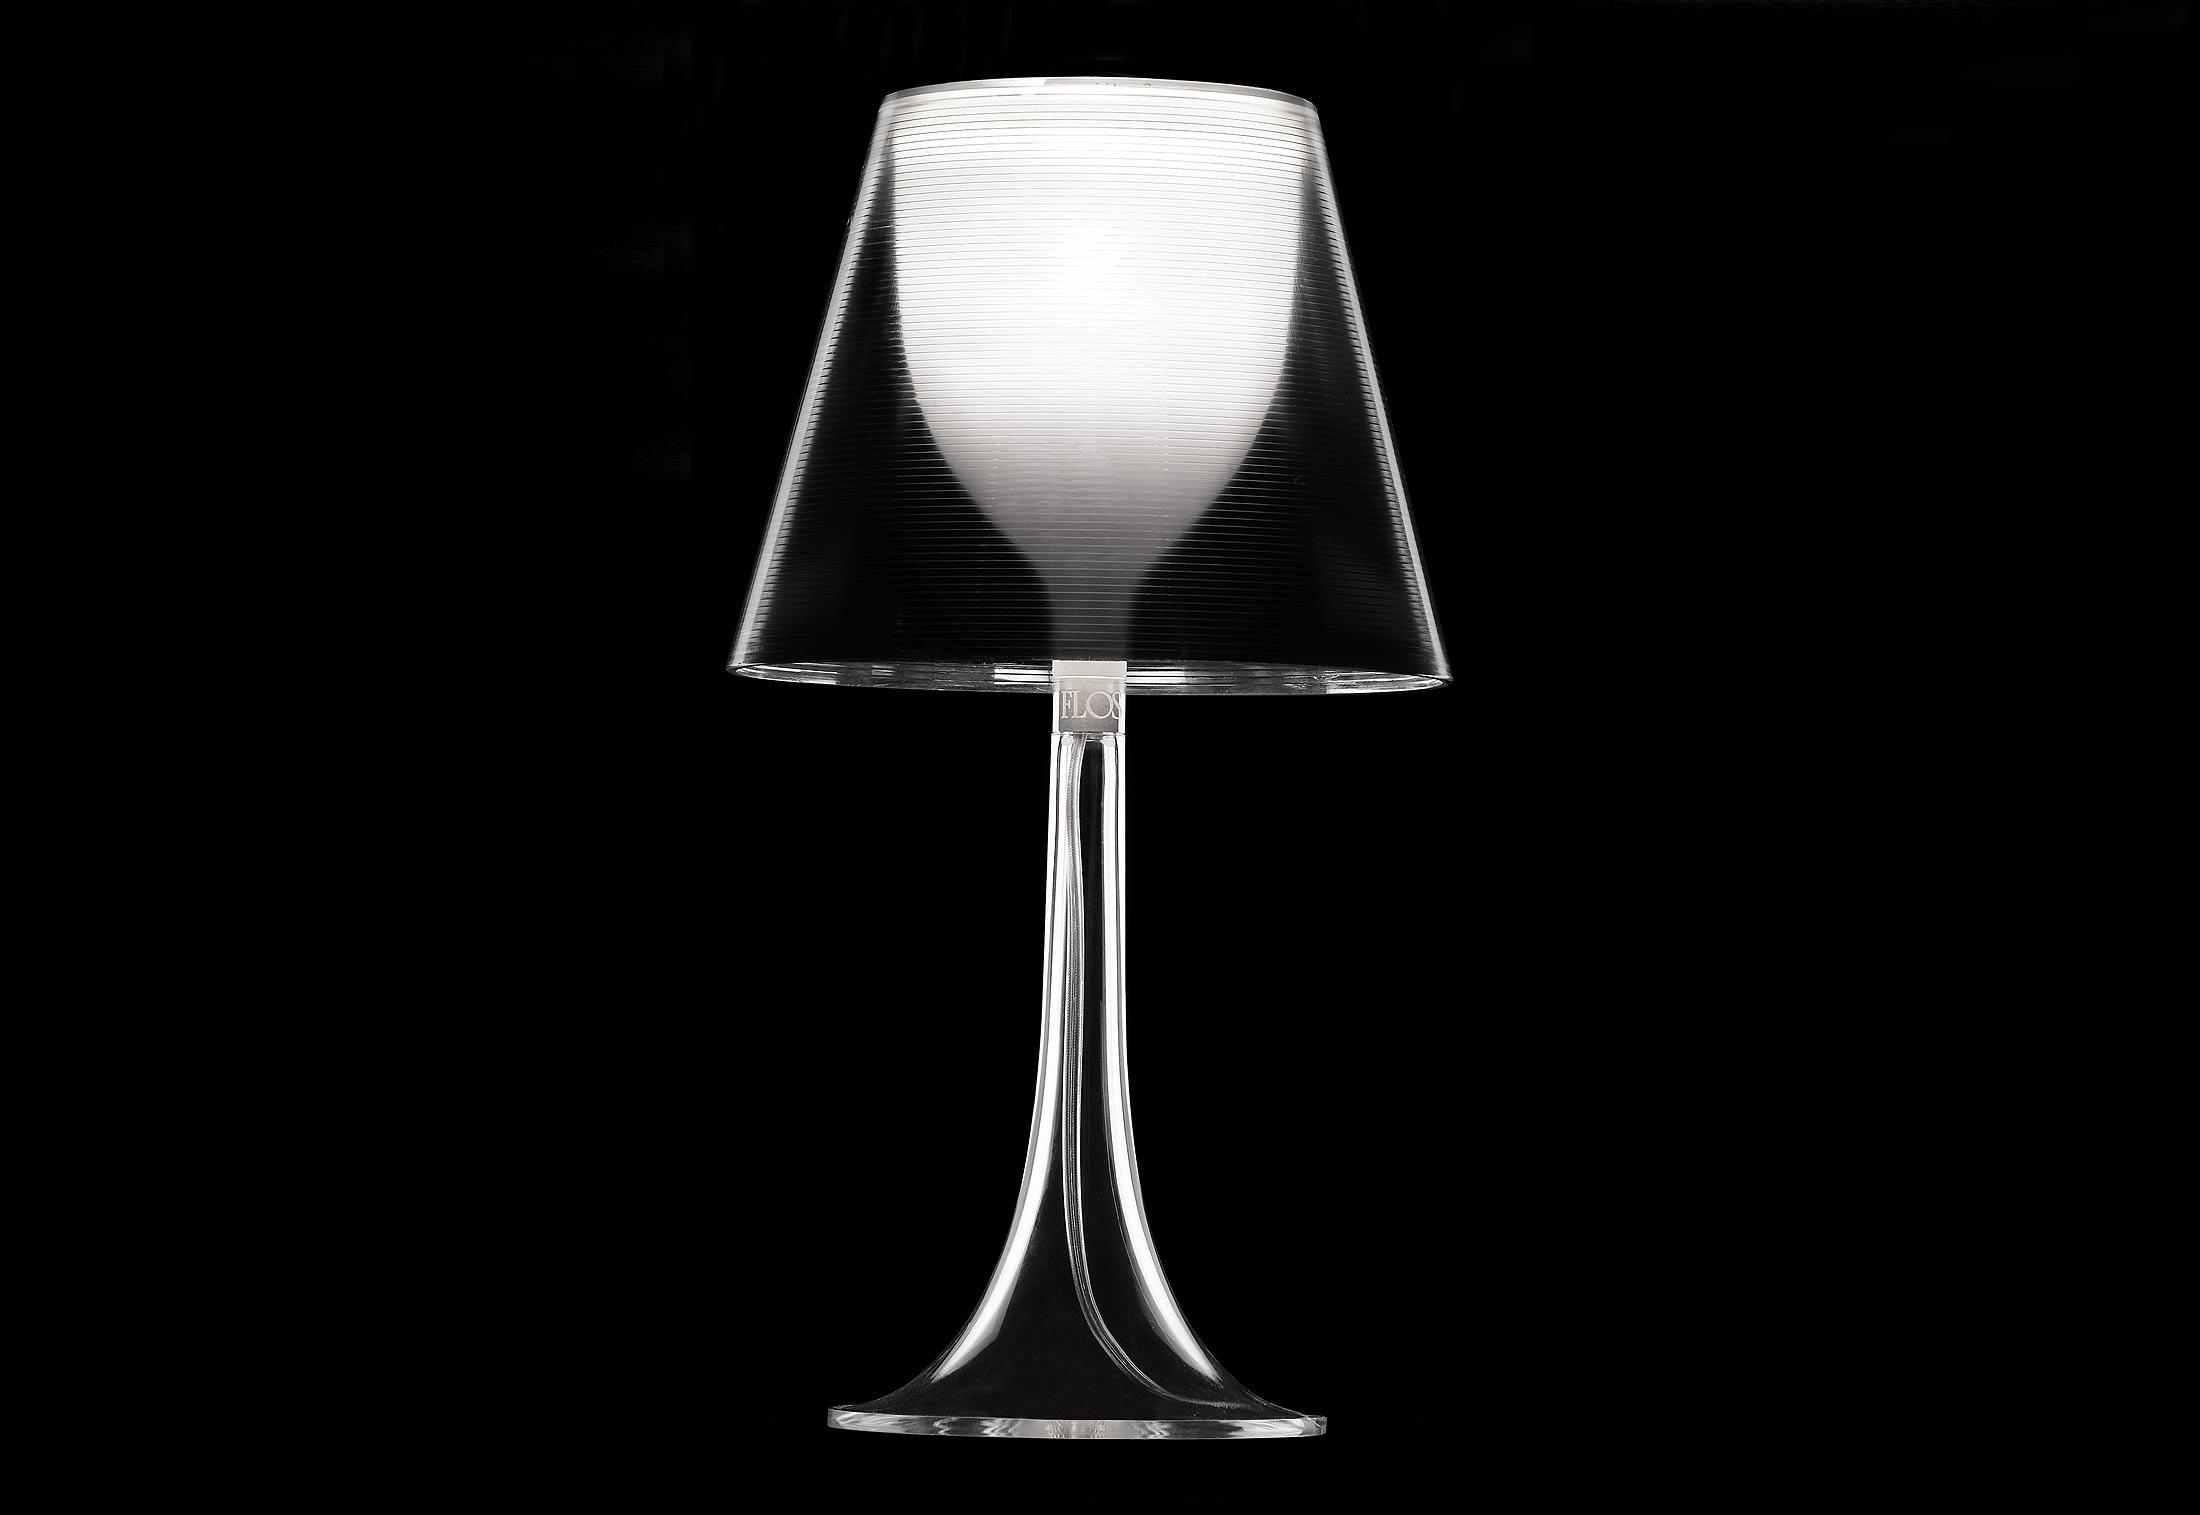 miss k t flos lampade da tavolo in lista nozze mollura. Black Bedroom Furniture Sets. Home Design Ideas